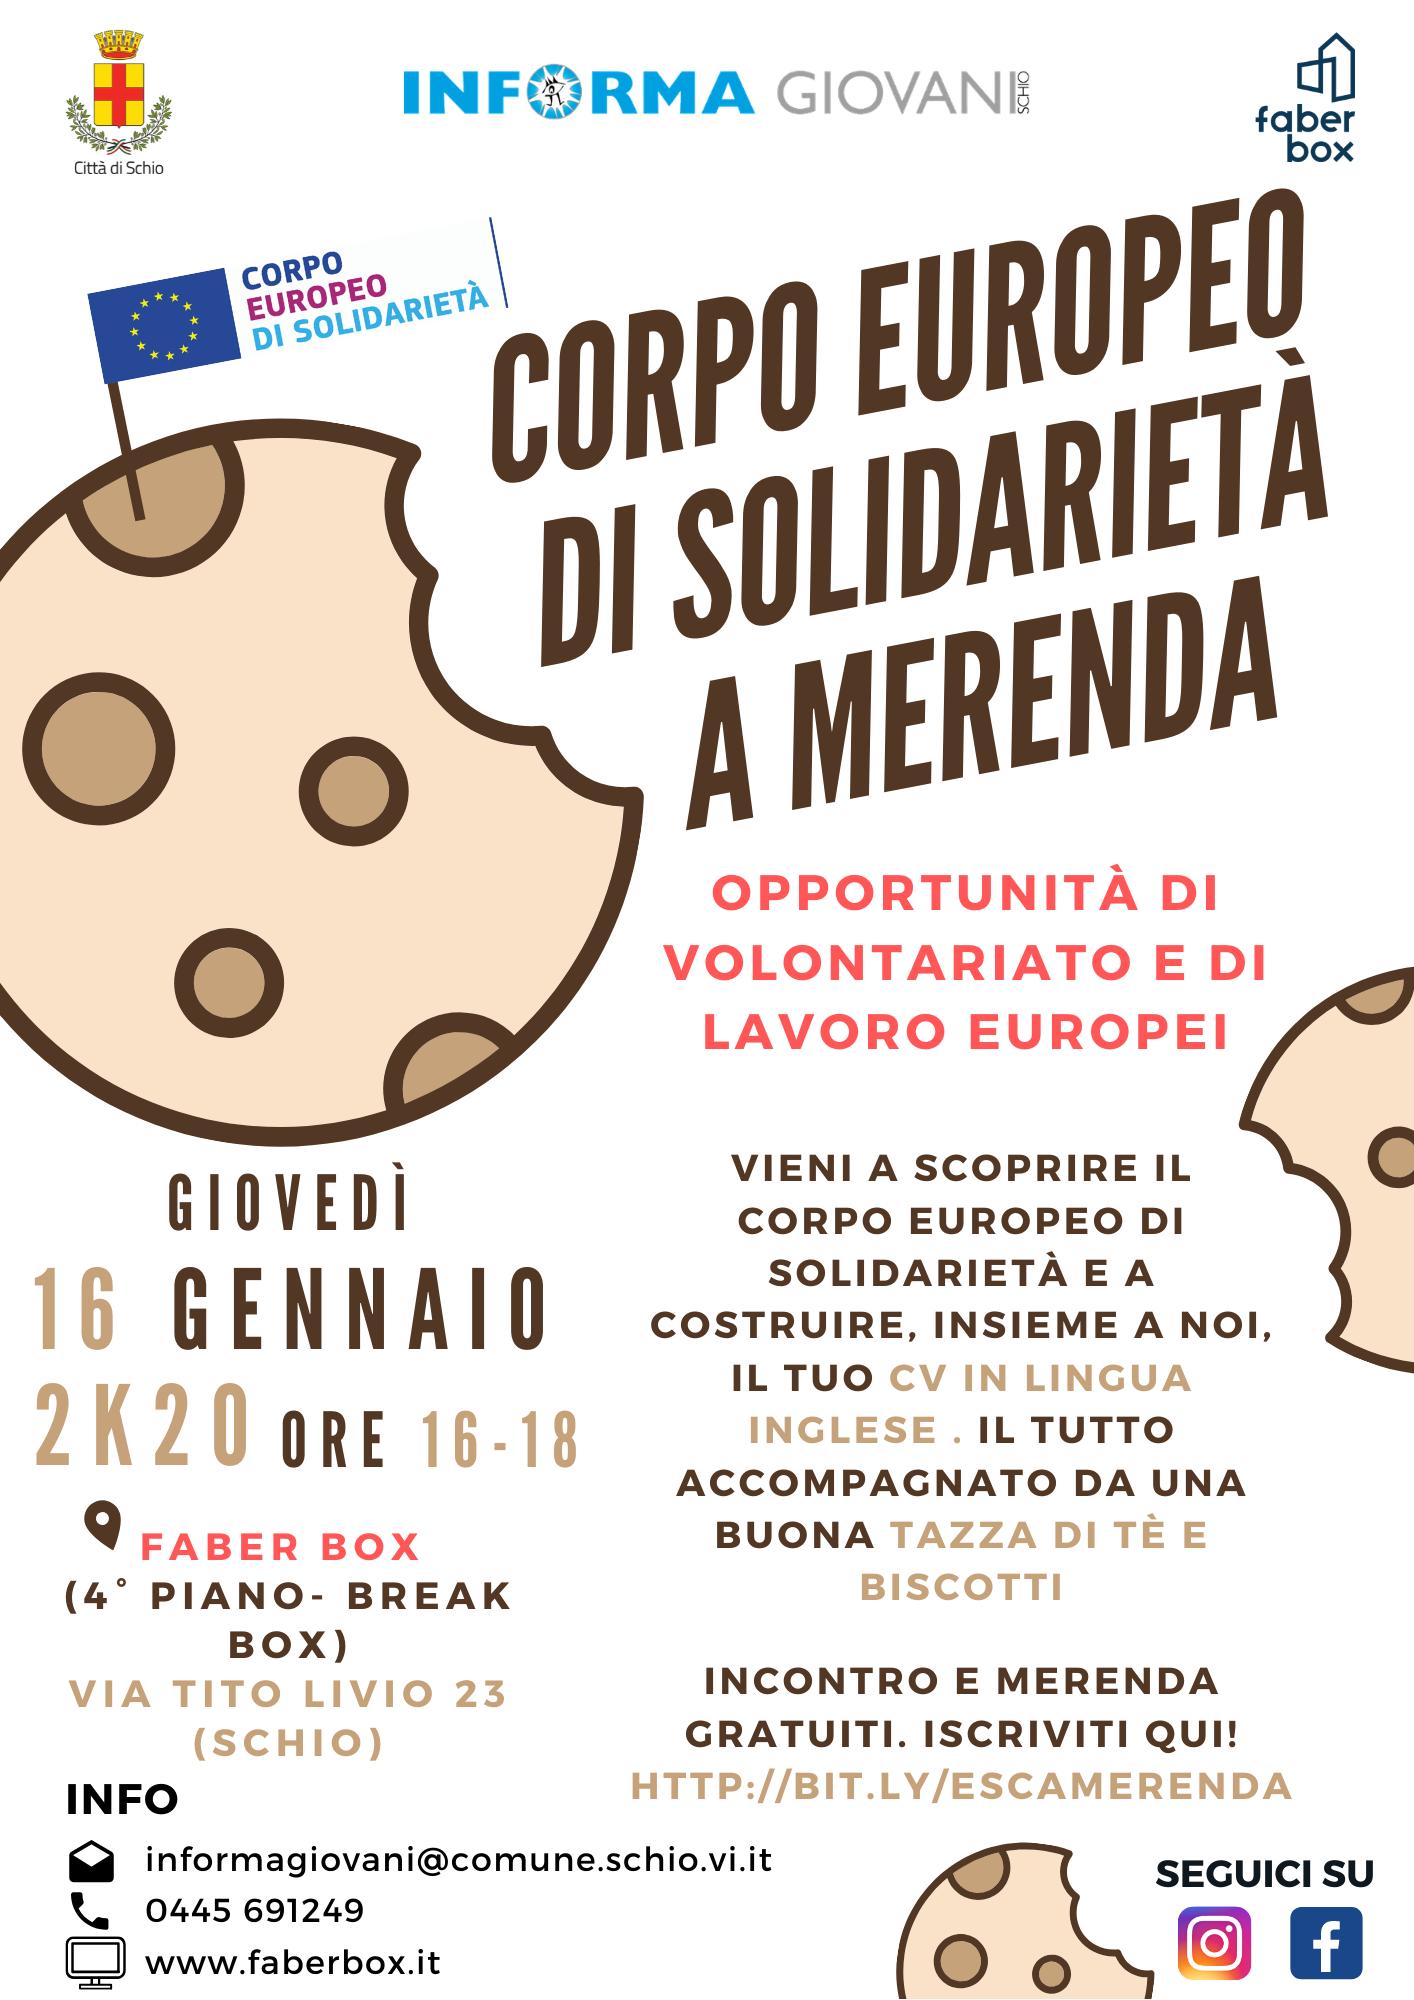 Corpo europeo di solidarietà a merenda